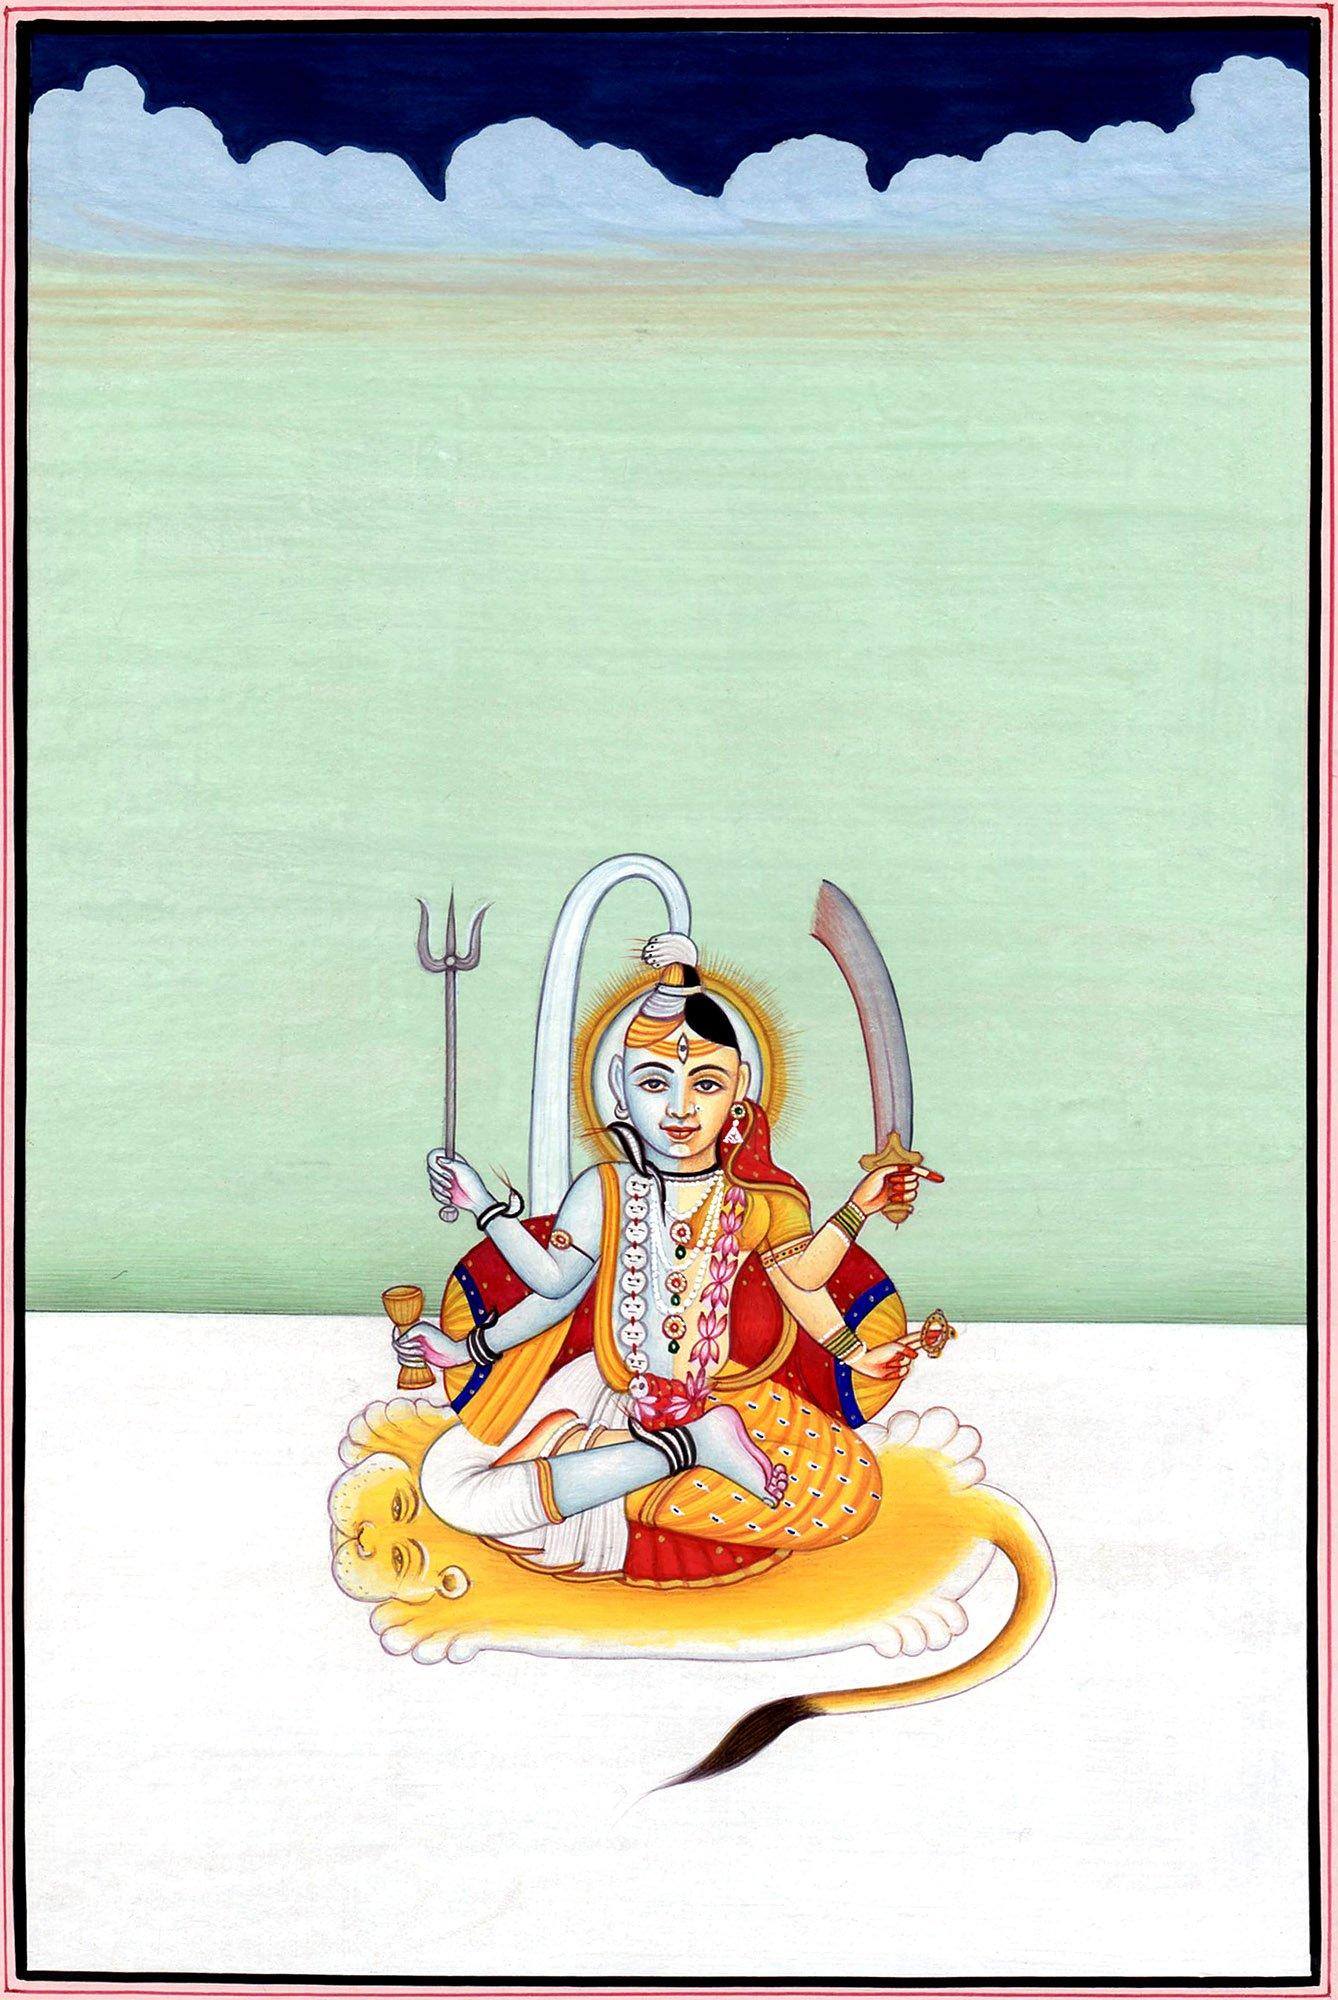 Purusha and Prakriti - Water Color Painting On Paper - Artist: Kailash Raj